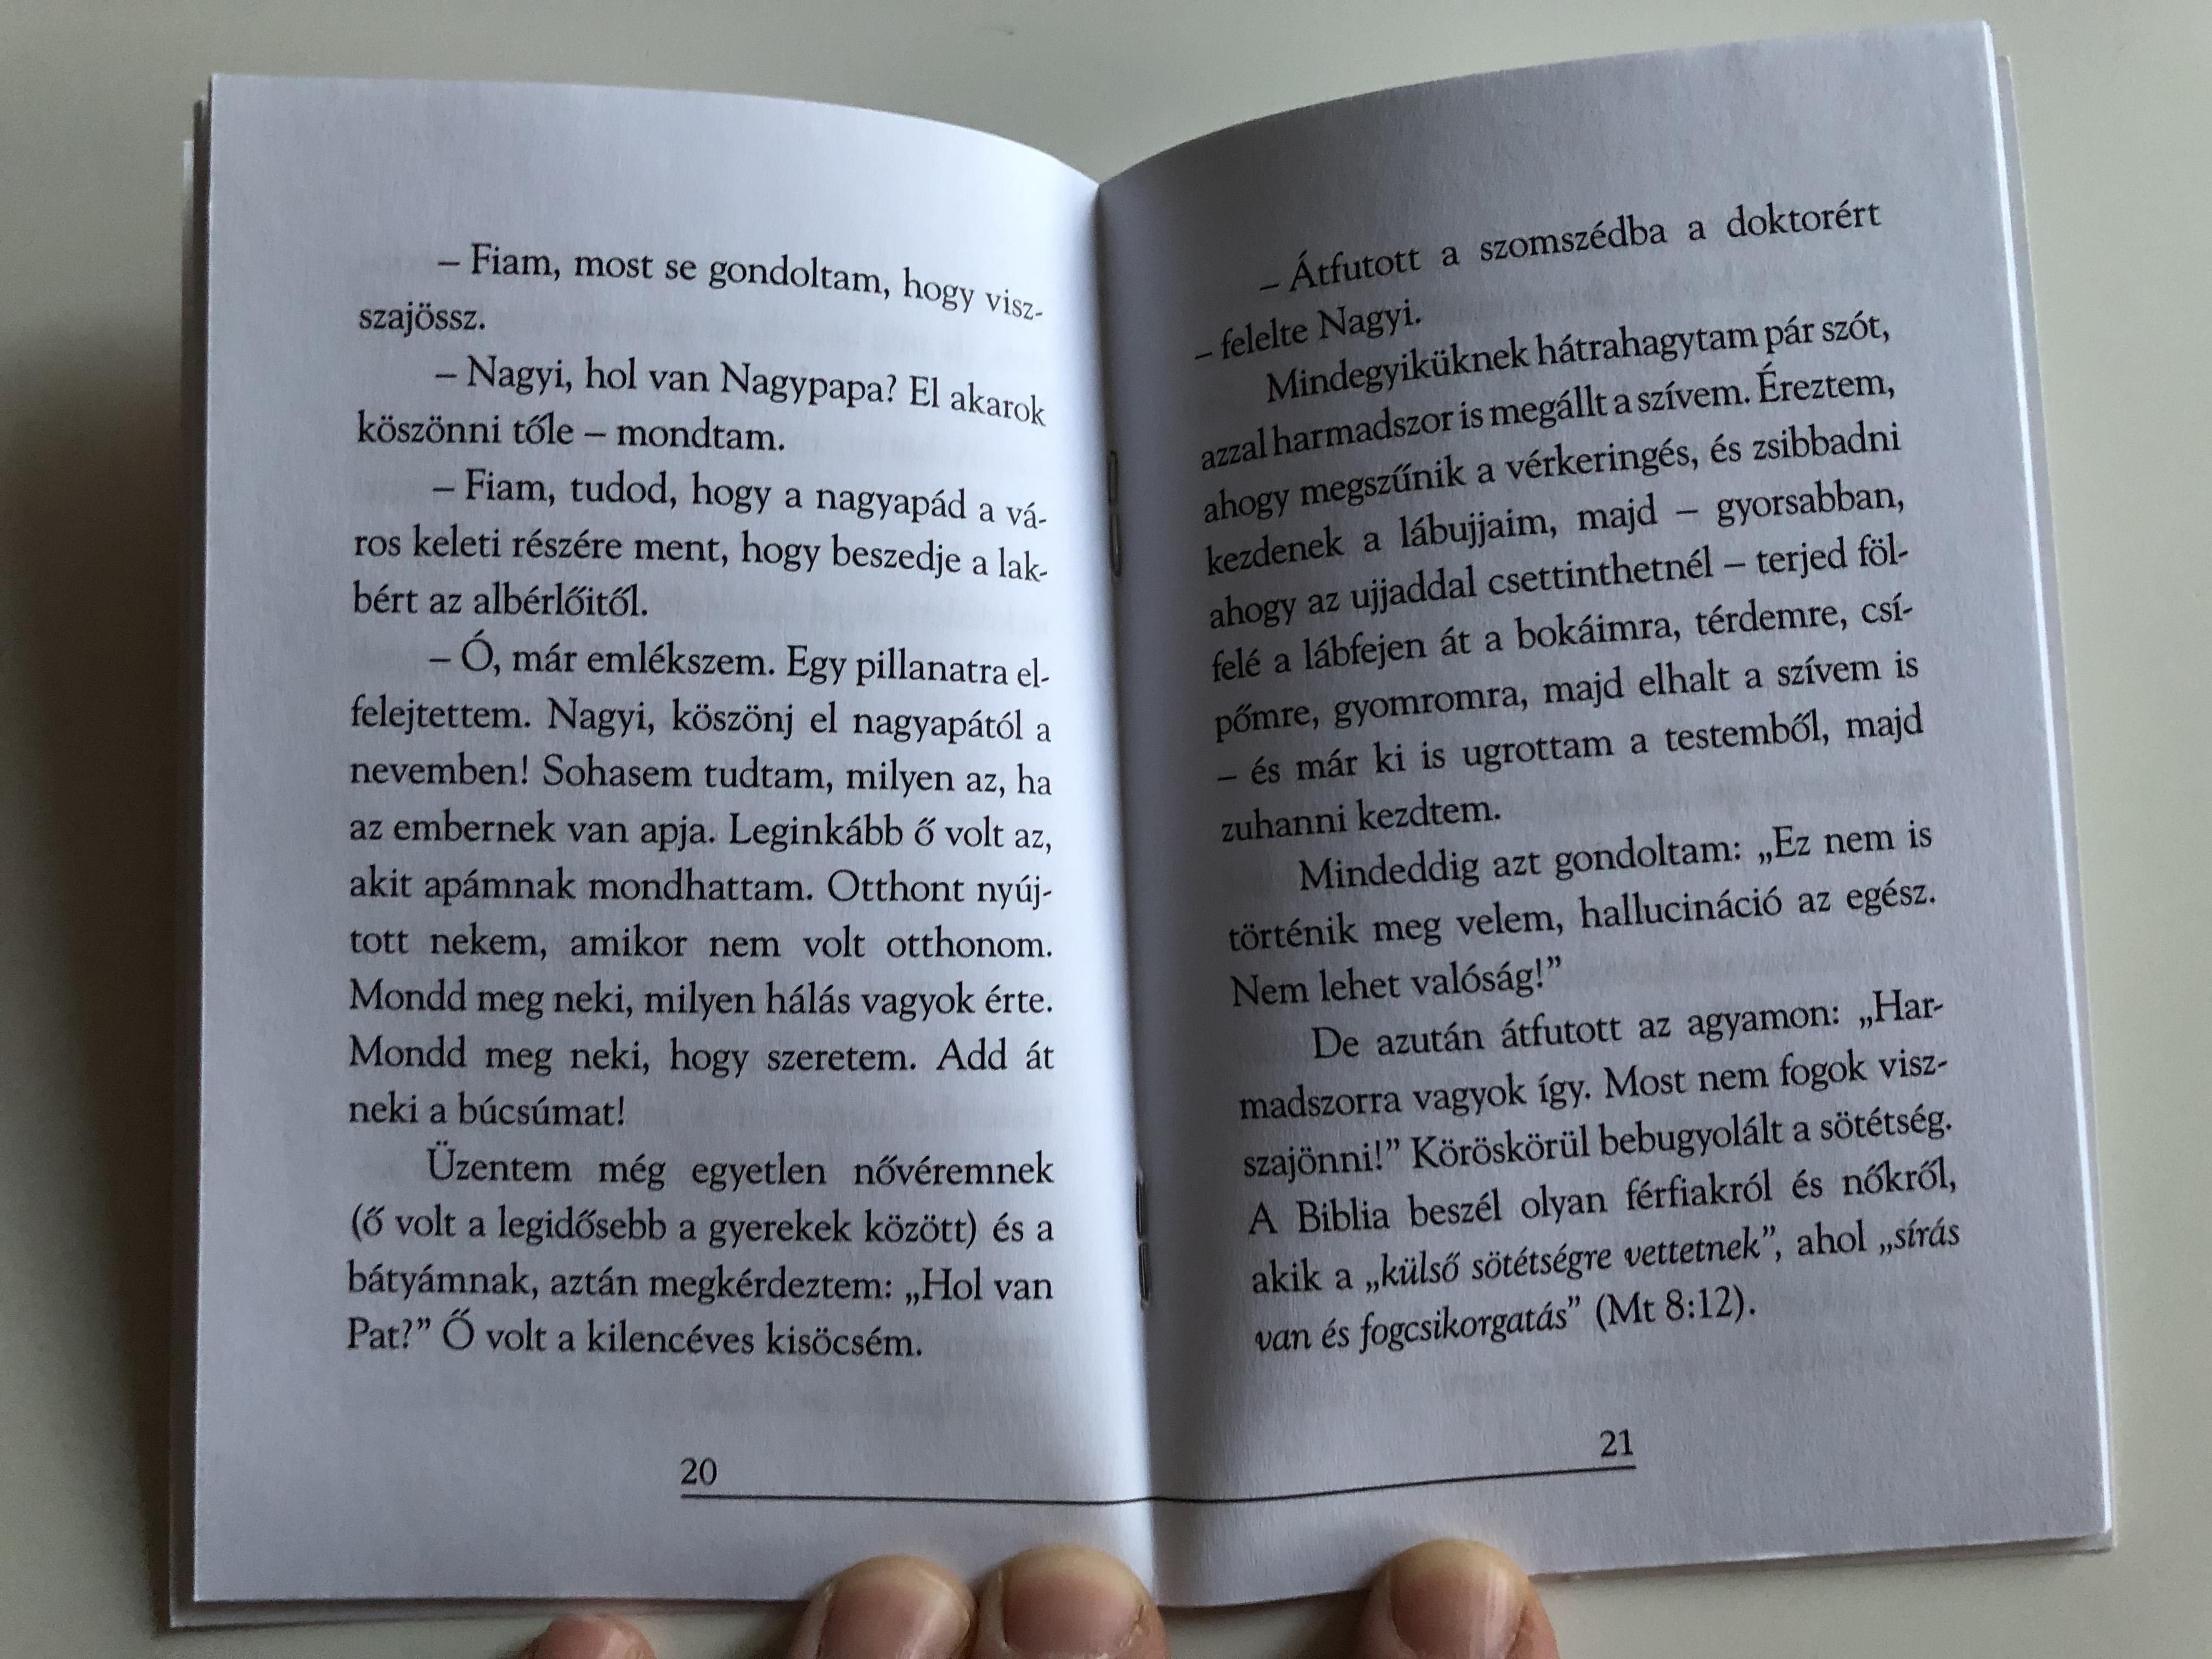 a-pokol-kapuj-ban-by-kenneth-e.-hagin-hungarian-edition-of-hell-6-.jpg